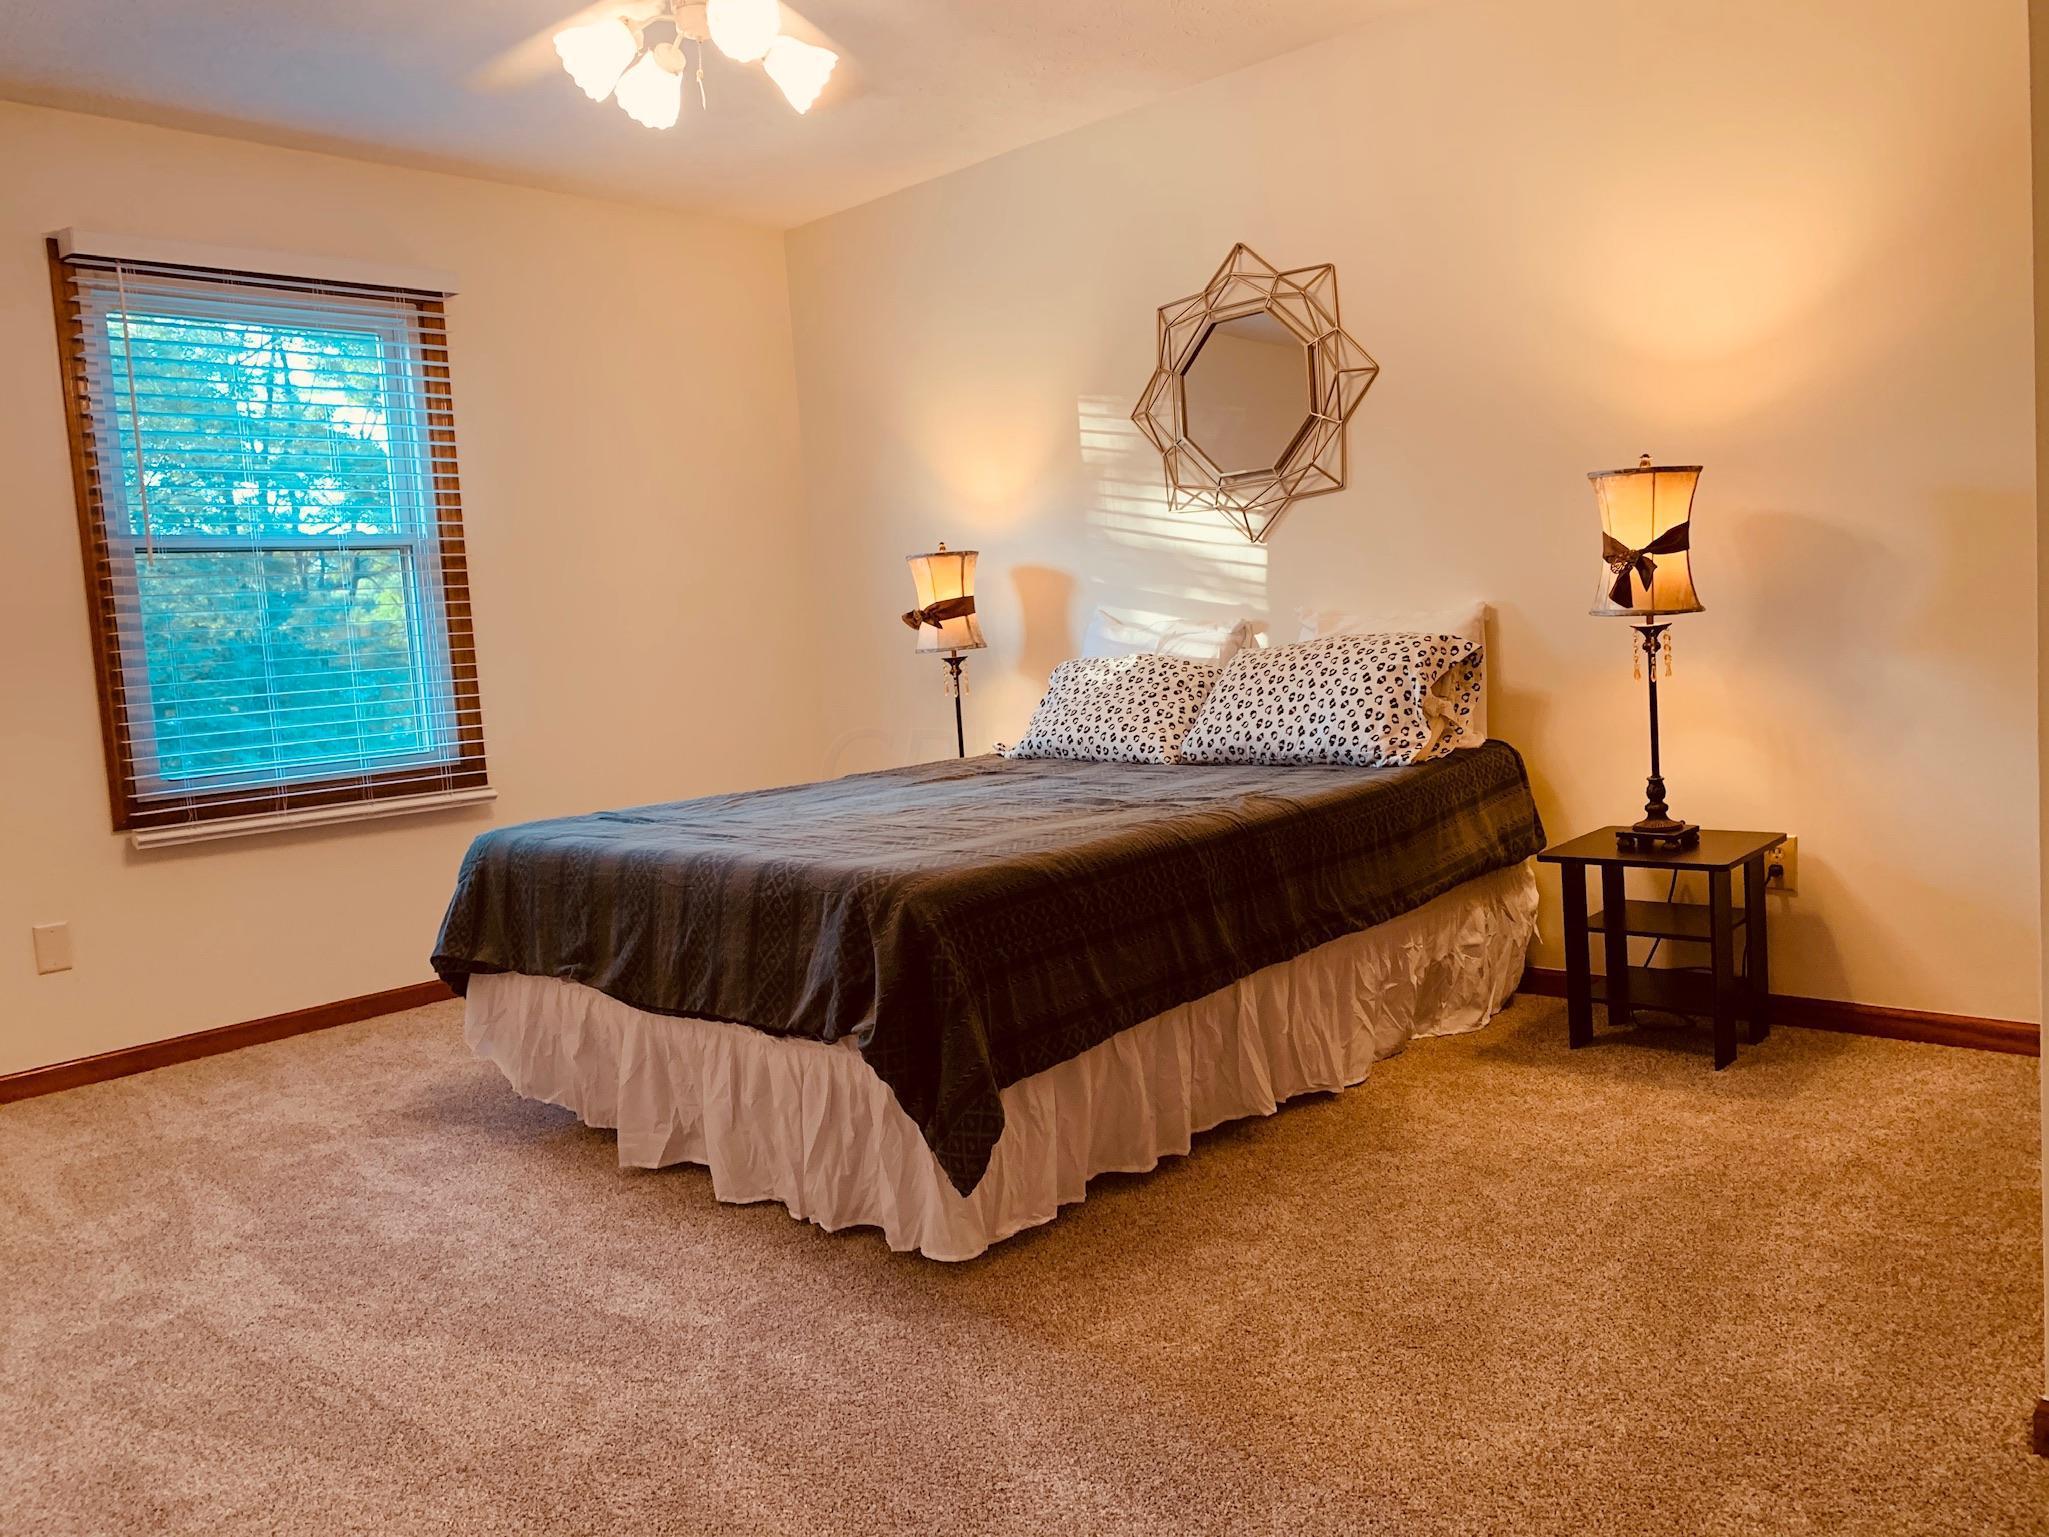 7497 Bardston Drive, Dublin, Ohio 43017, 4 Bedrooms Bedrooms, ,4 BathroomsBathrooms,Residential,For Sale,Bardston,220024152